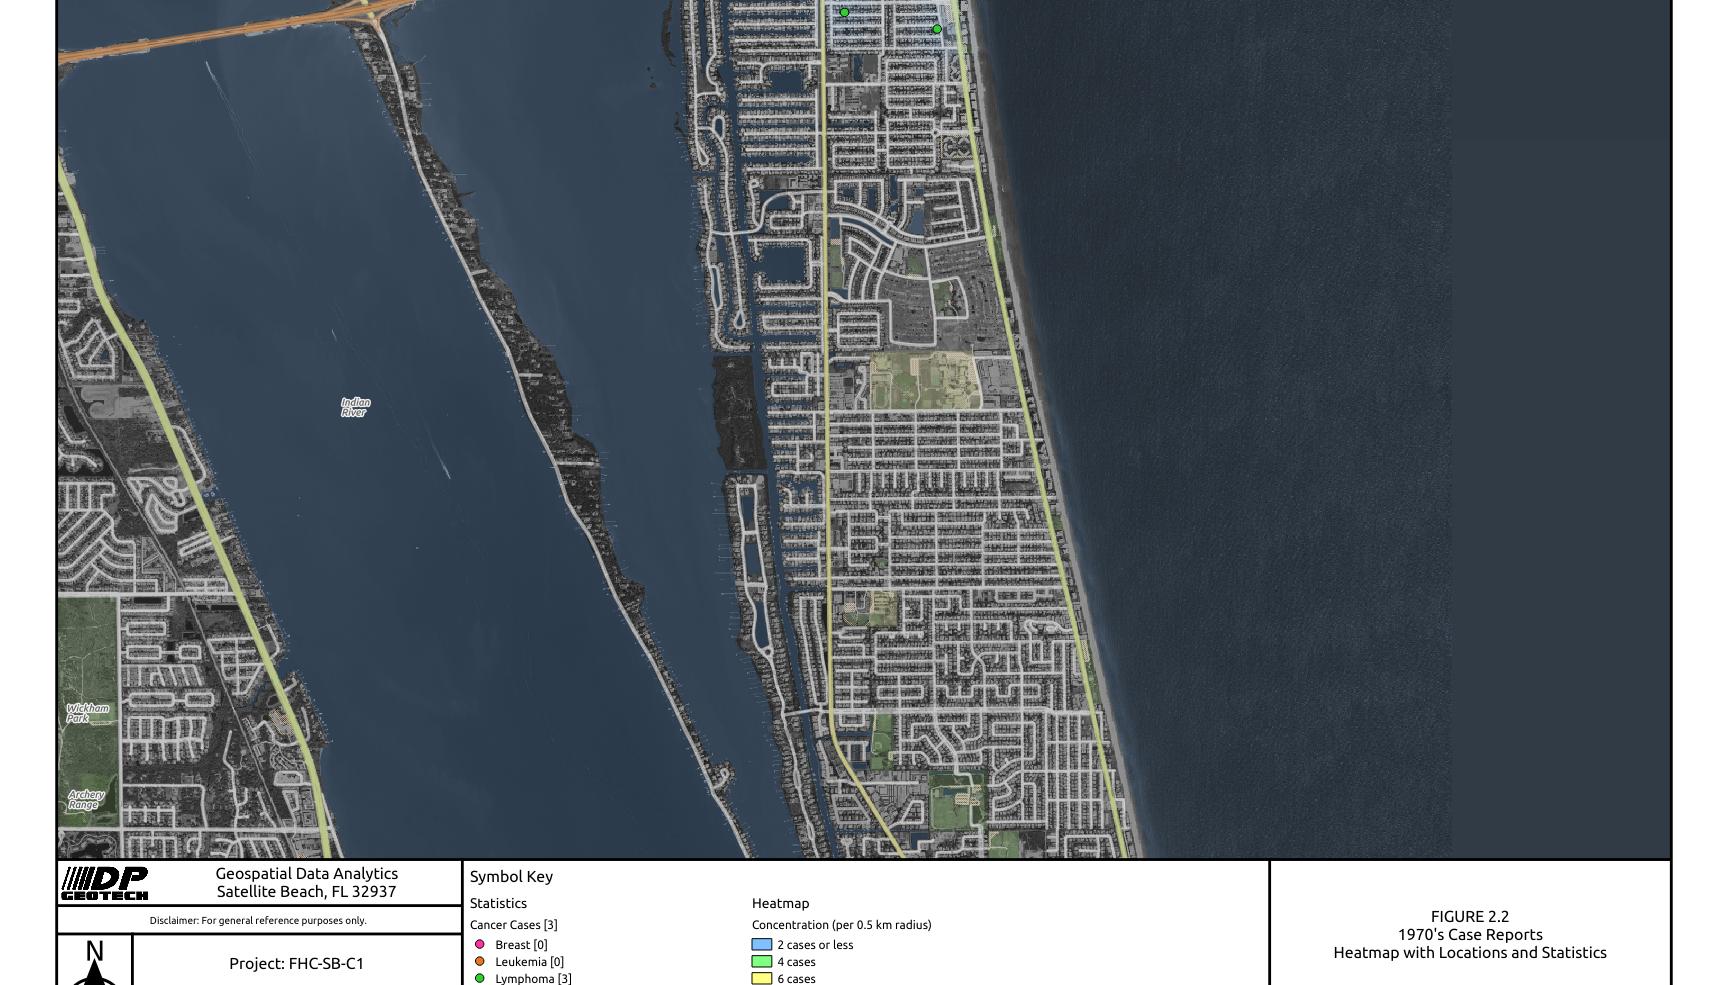 1970 Satellite Beach Cancer Cases Heat Map